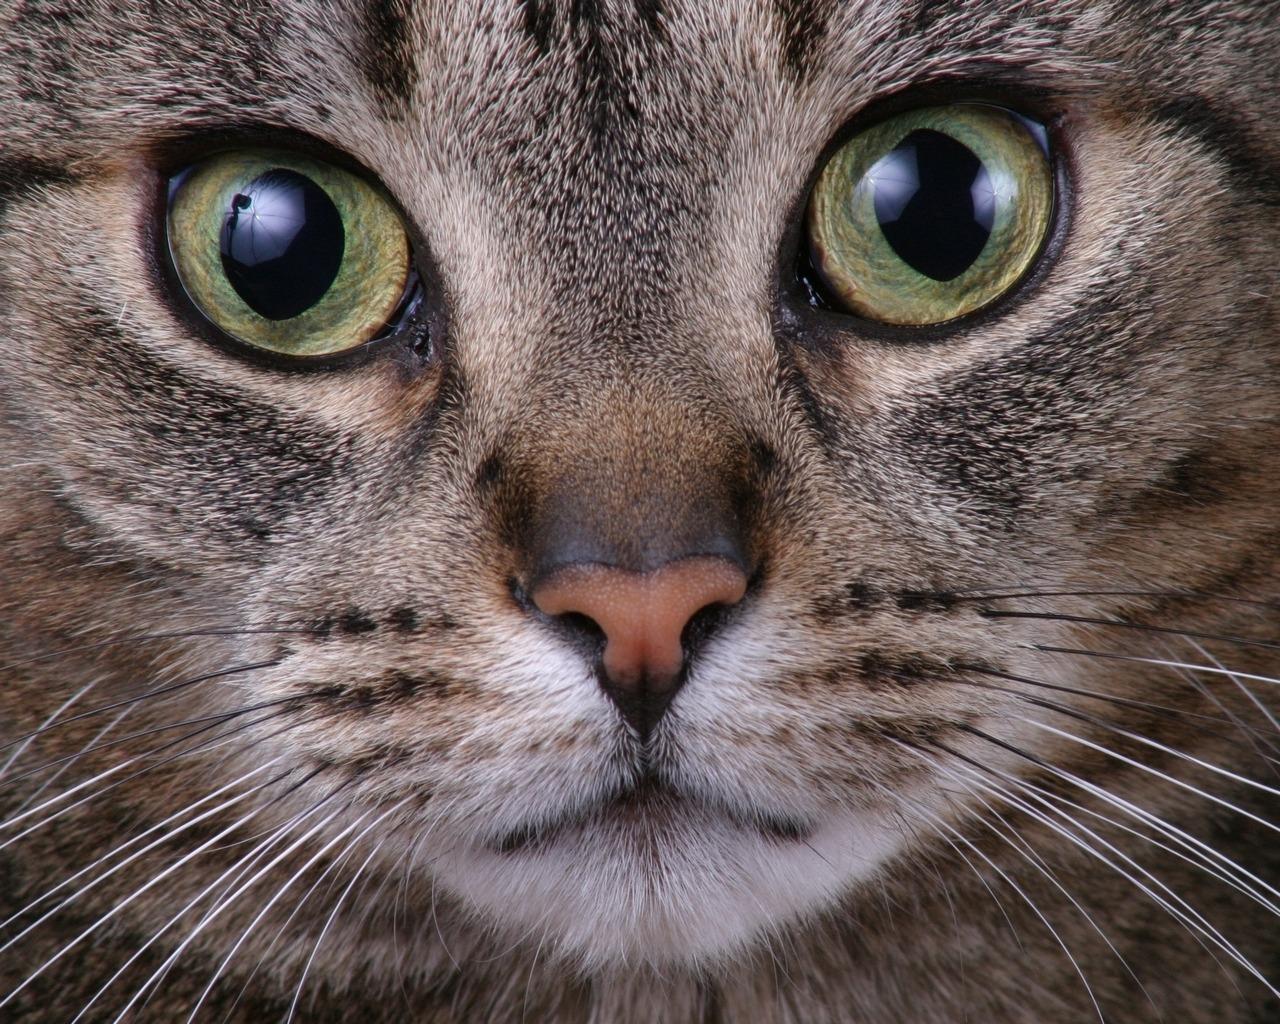 /var/www/html/wp-content/uploads/2018/08/mirada-felina-curiosa